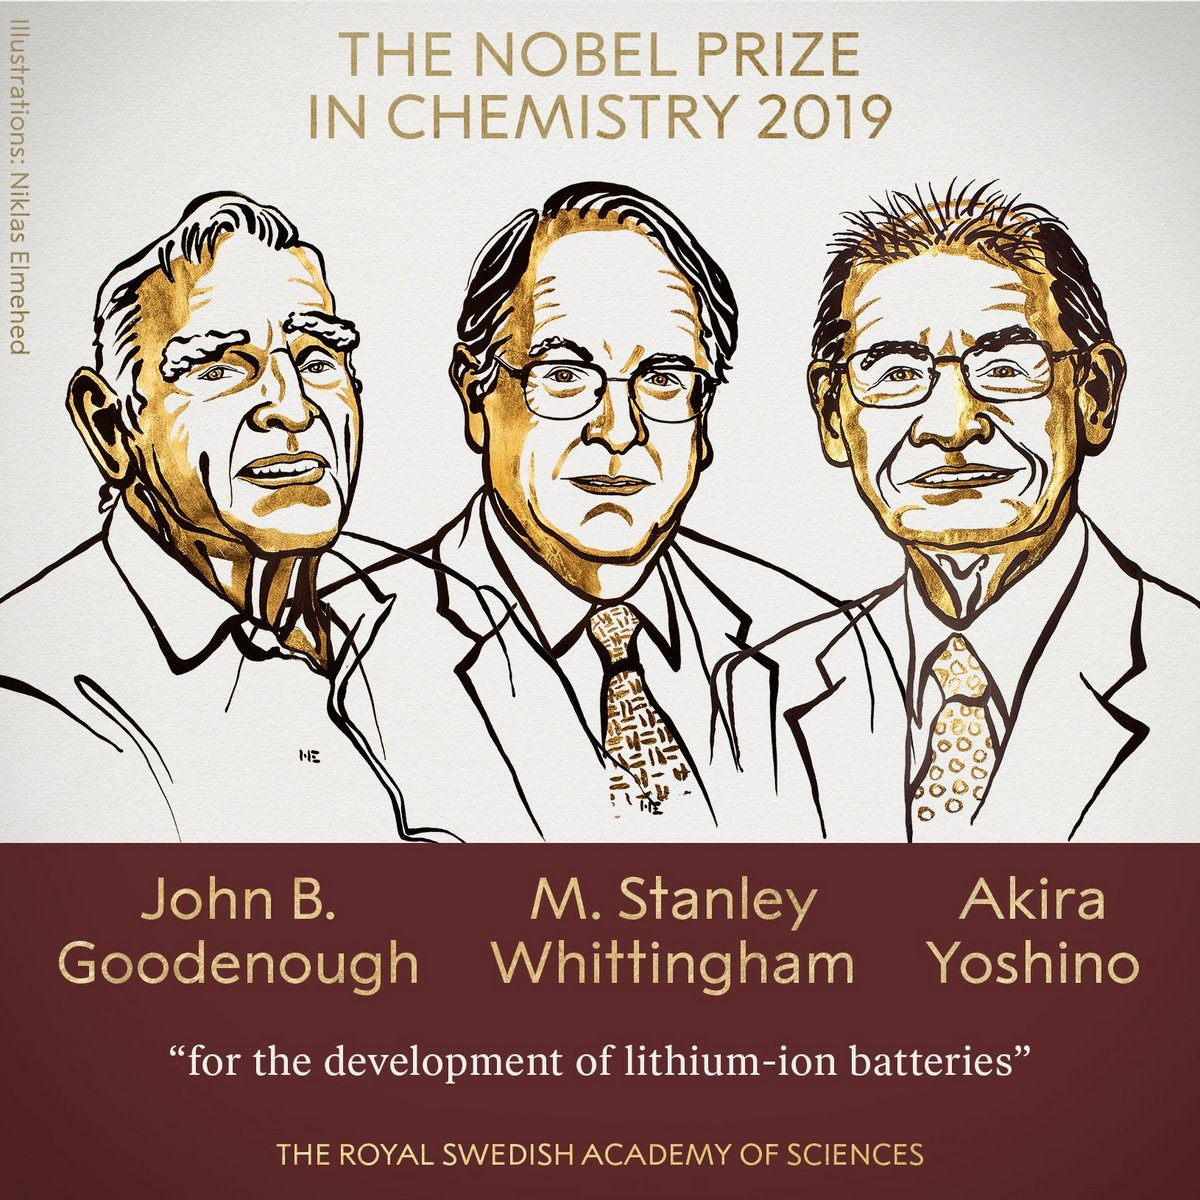 Prix Nobel de chimie 2019